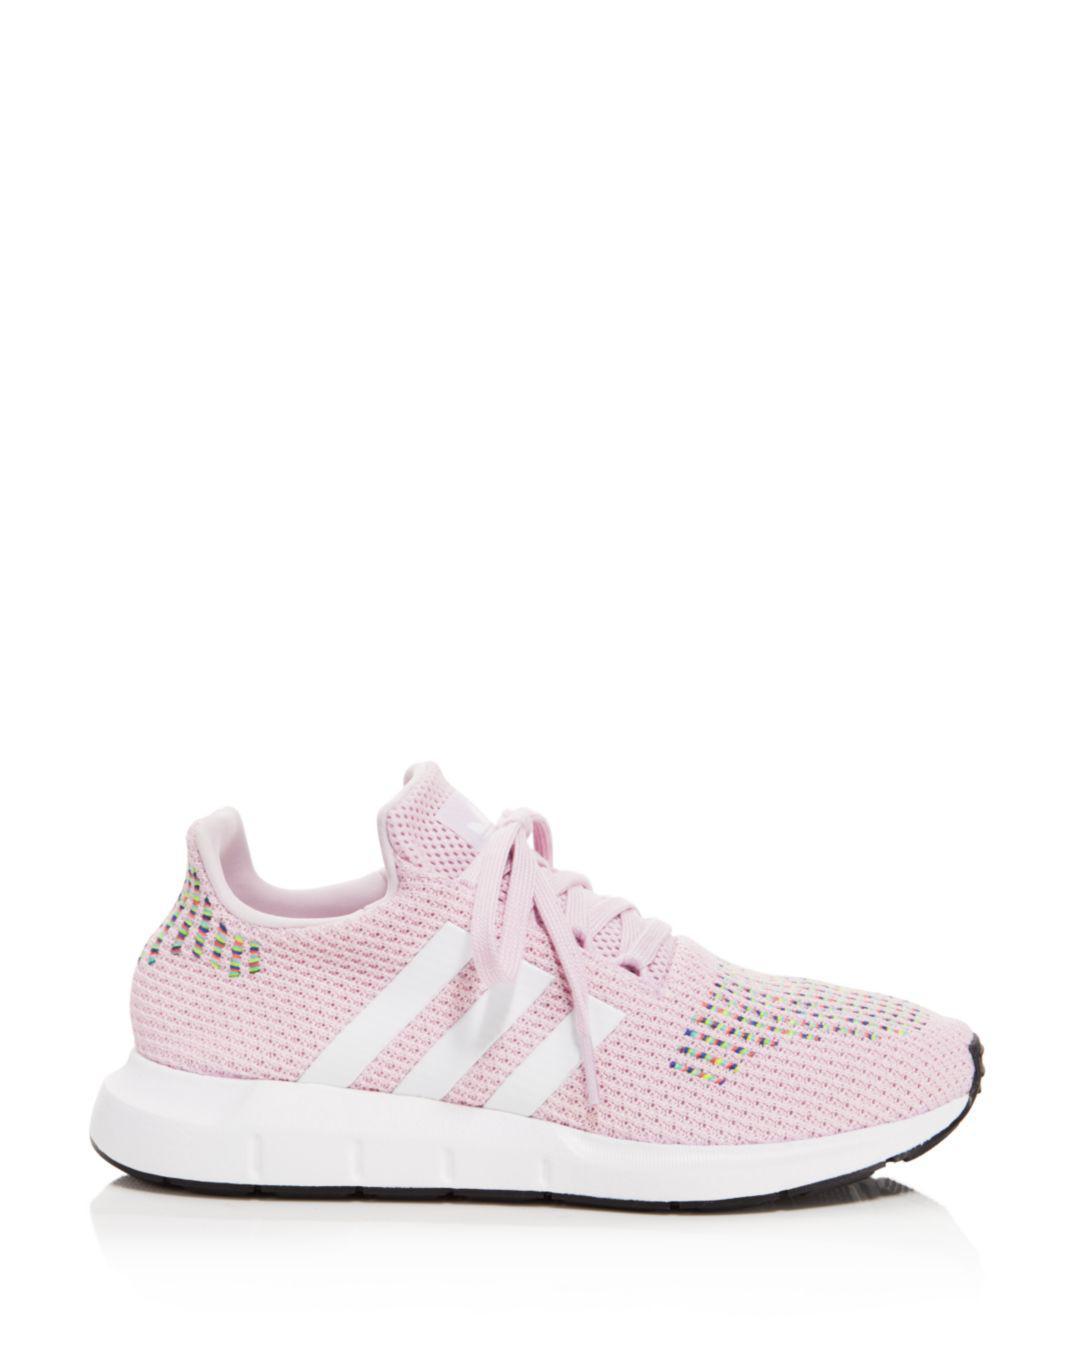 d761f9ebbbe Adidas Women s Swift Run Knit Lace Up Sneakers in Pink - Lyst